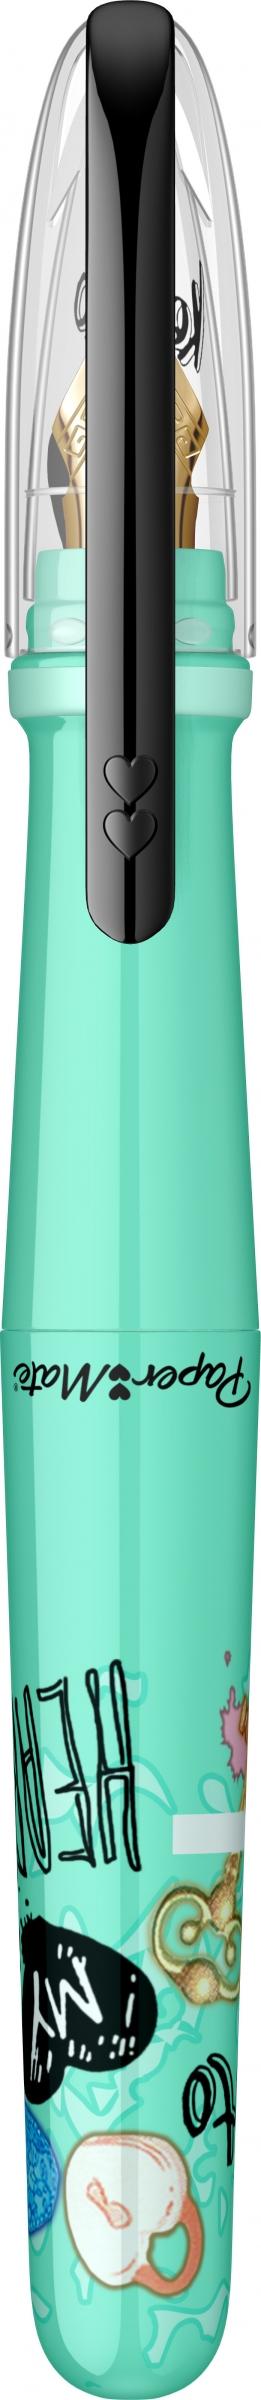 Turquoise Heart-410